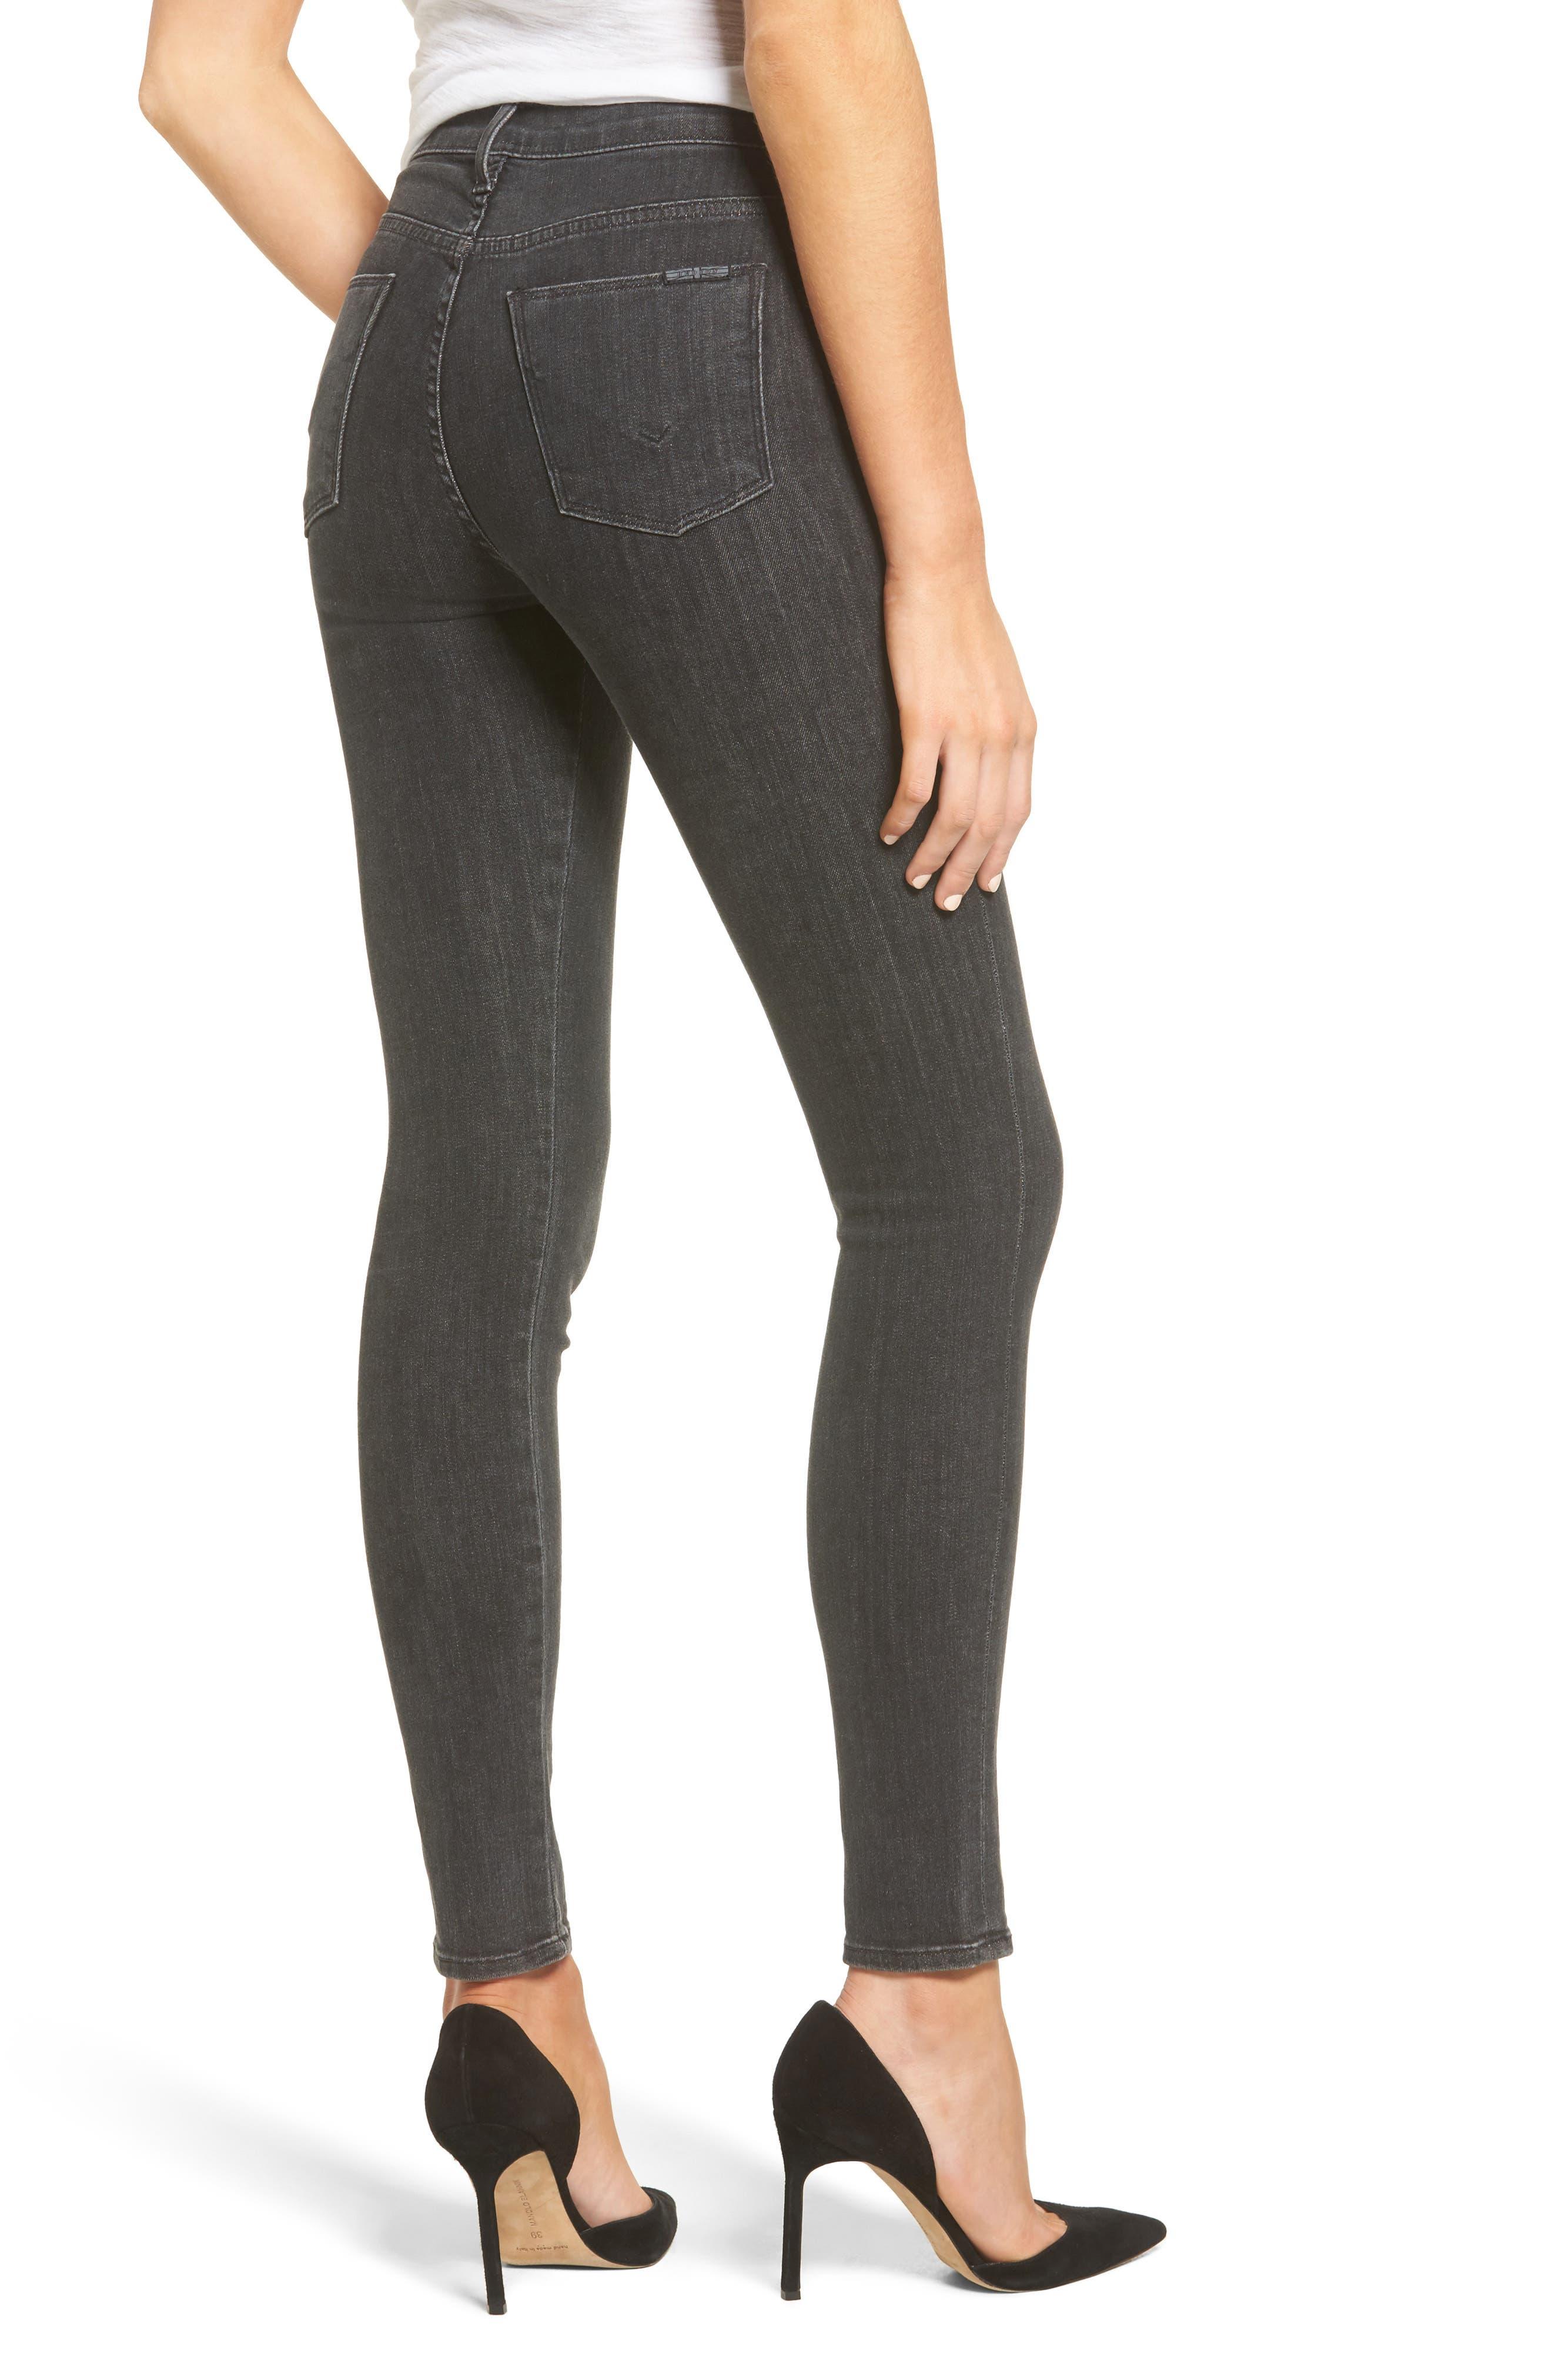 Bullocks High Waist Lace-Up Skinny Jeans,                             Alternate thumbnail 2, color,